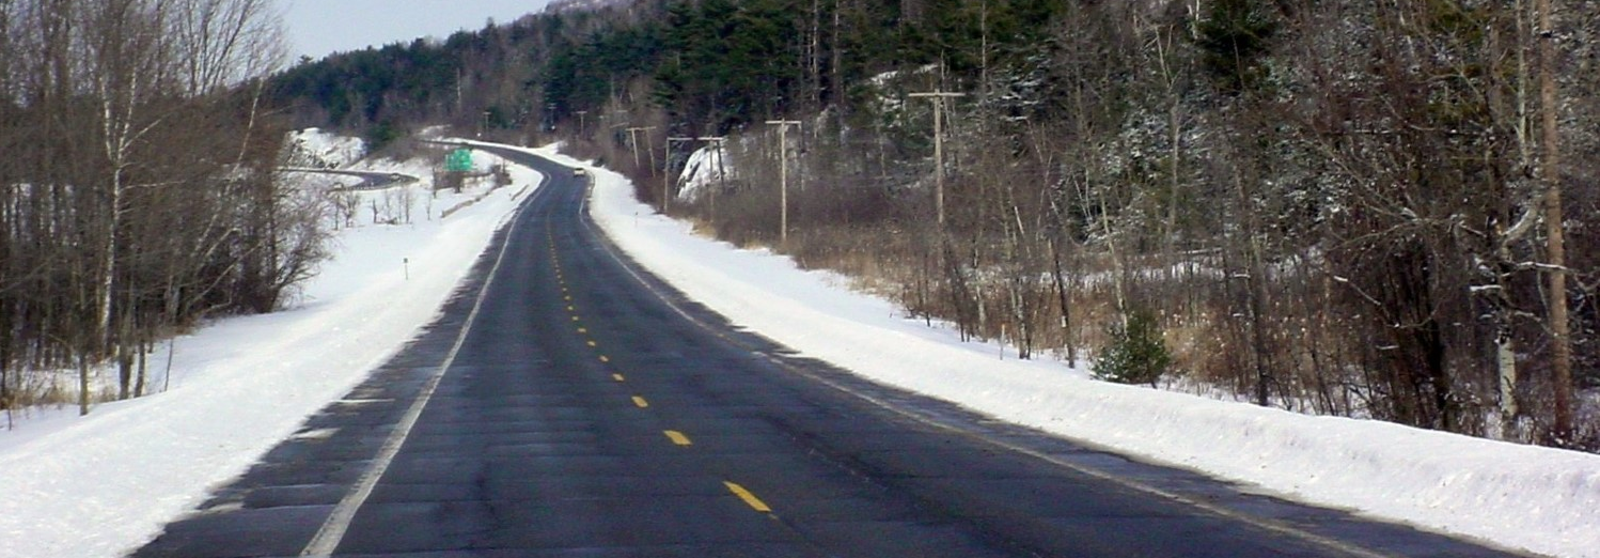 wyoming-winter-road Wyoming Anti-Icing & Deicing